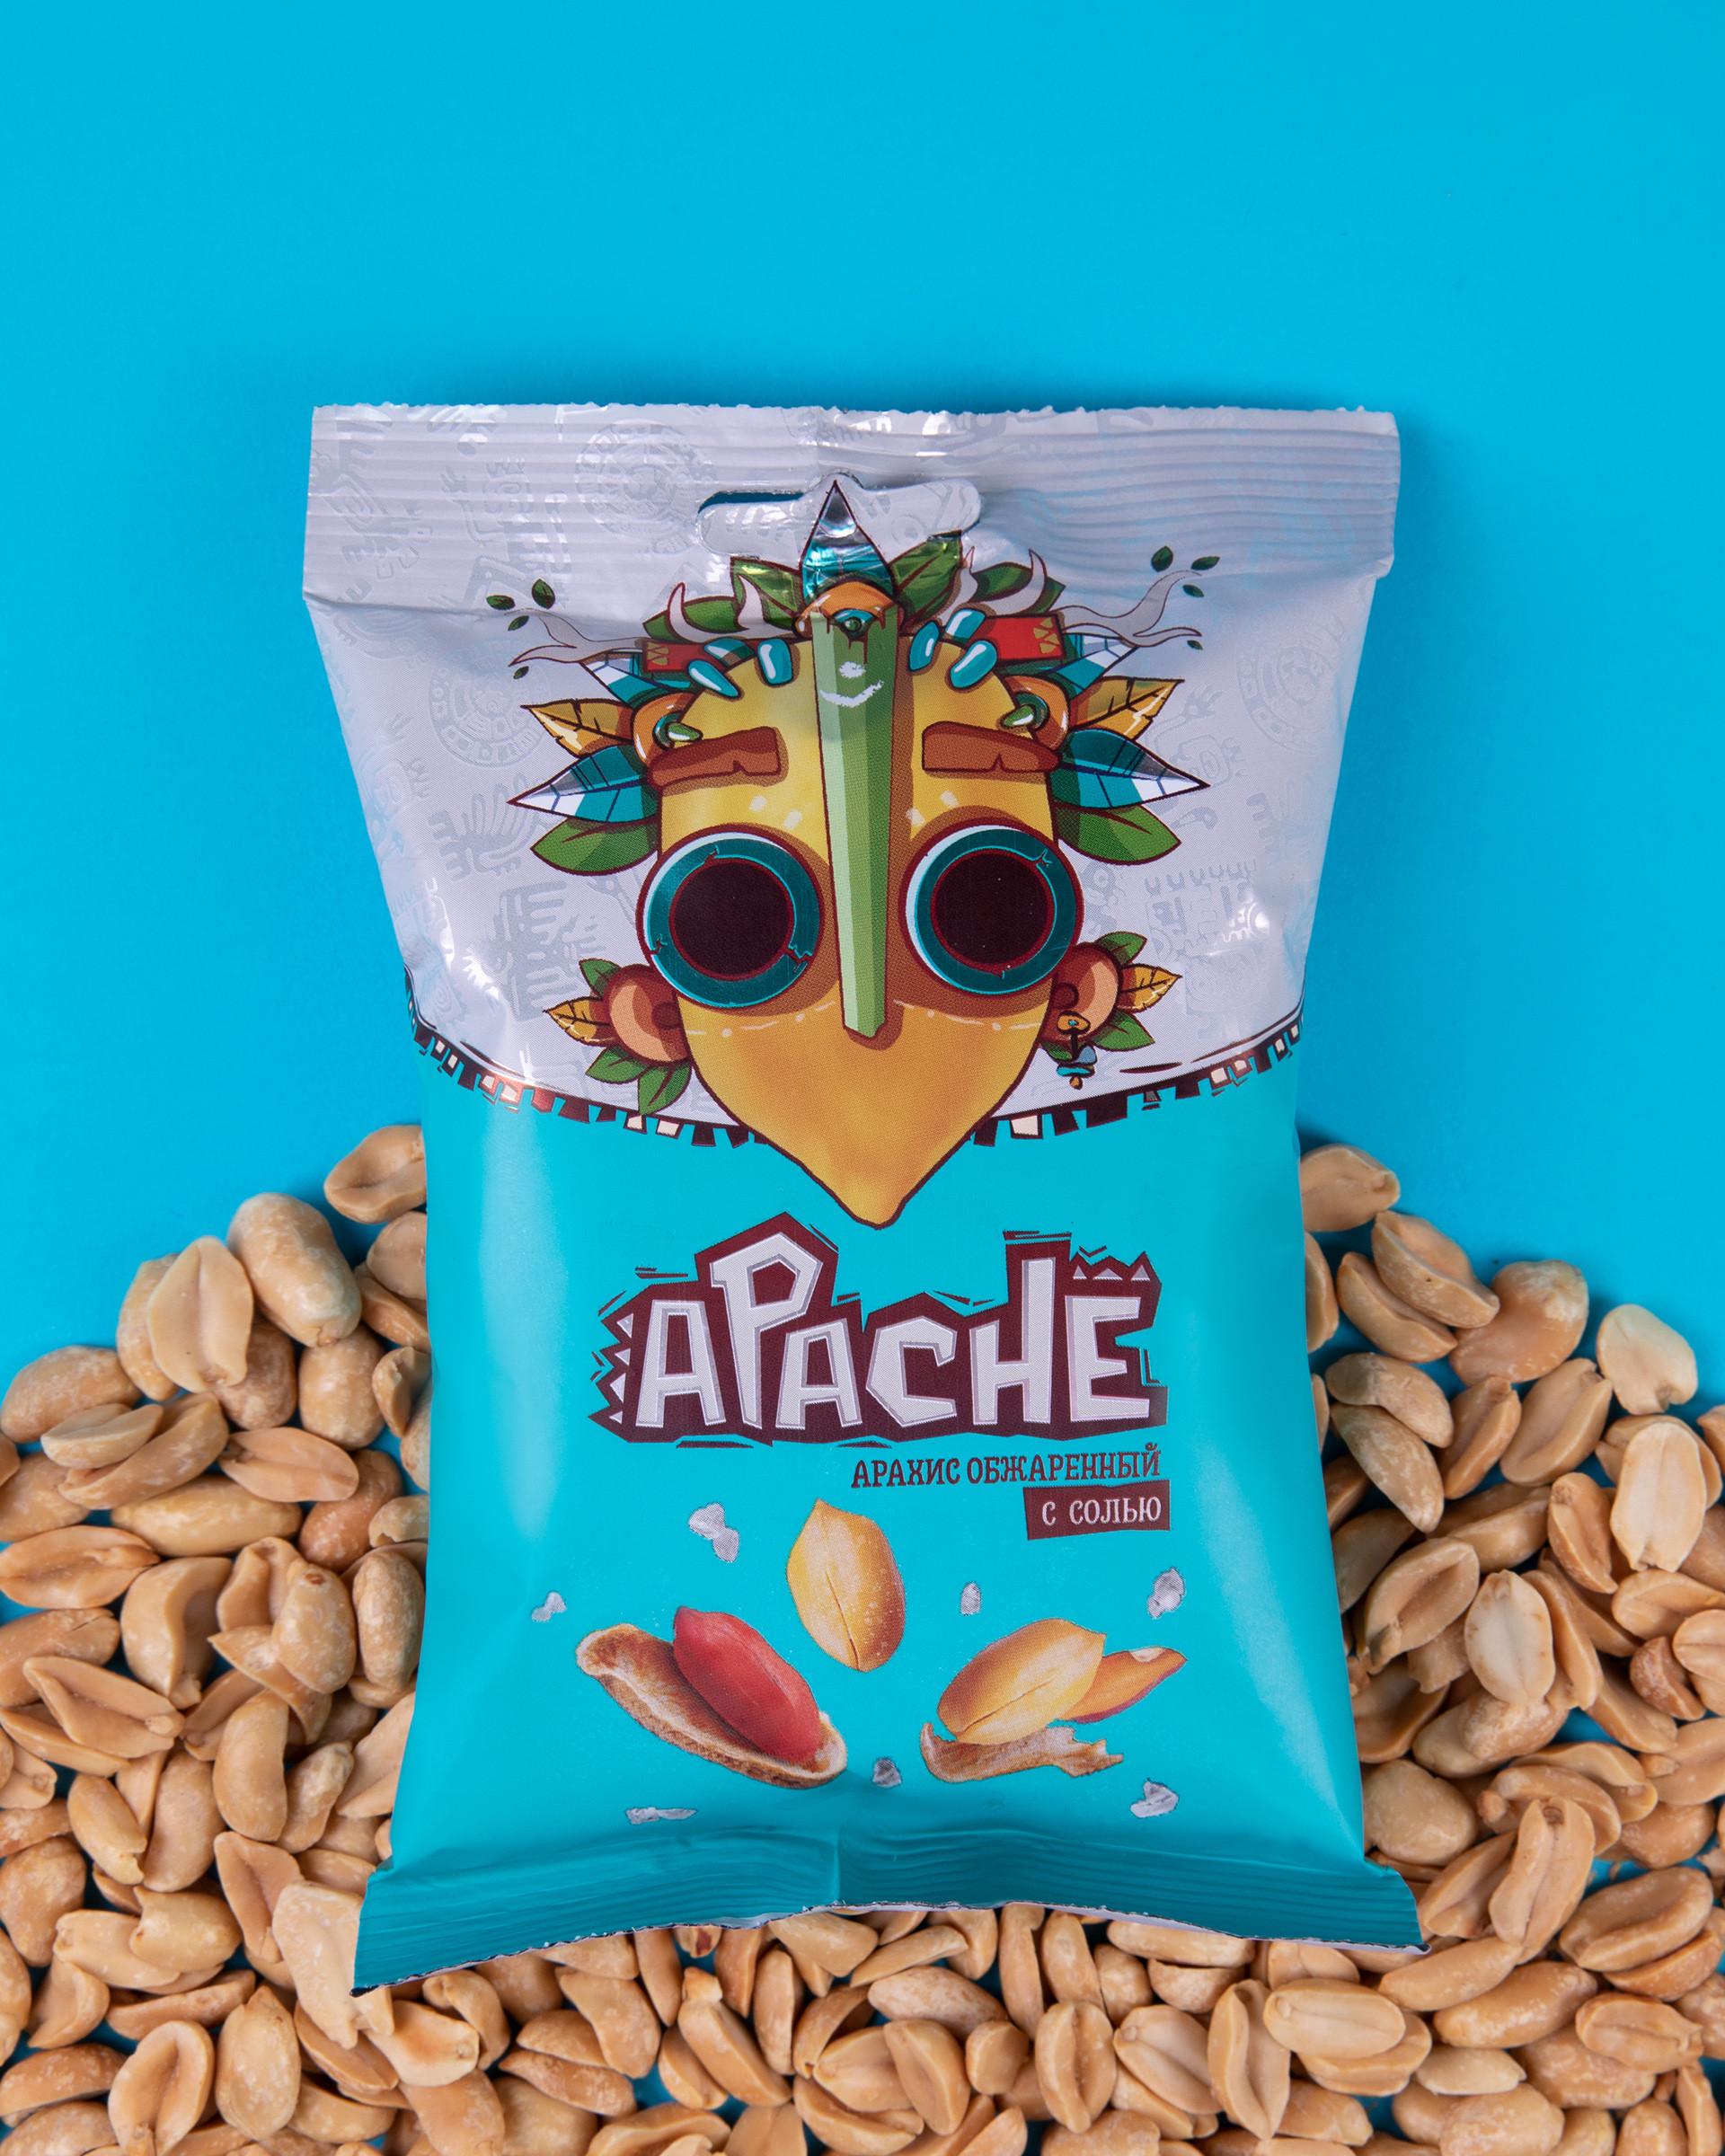 Apache Peanut